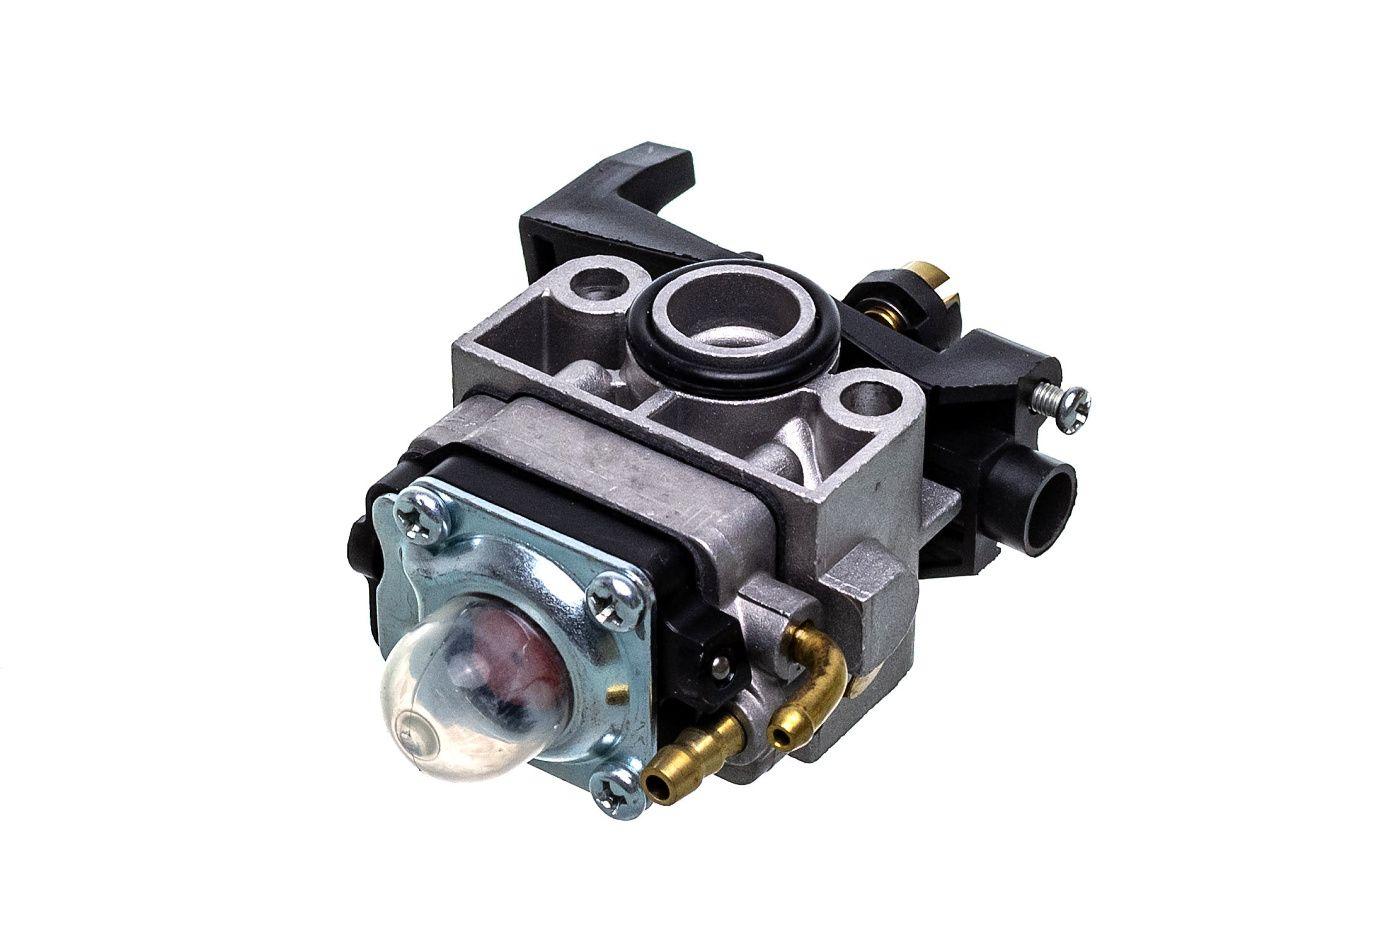 Karburátor Honda GX25, GX25N, GX25NT, FG110, 16100-Z0H-825 SUPER AKCE